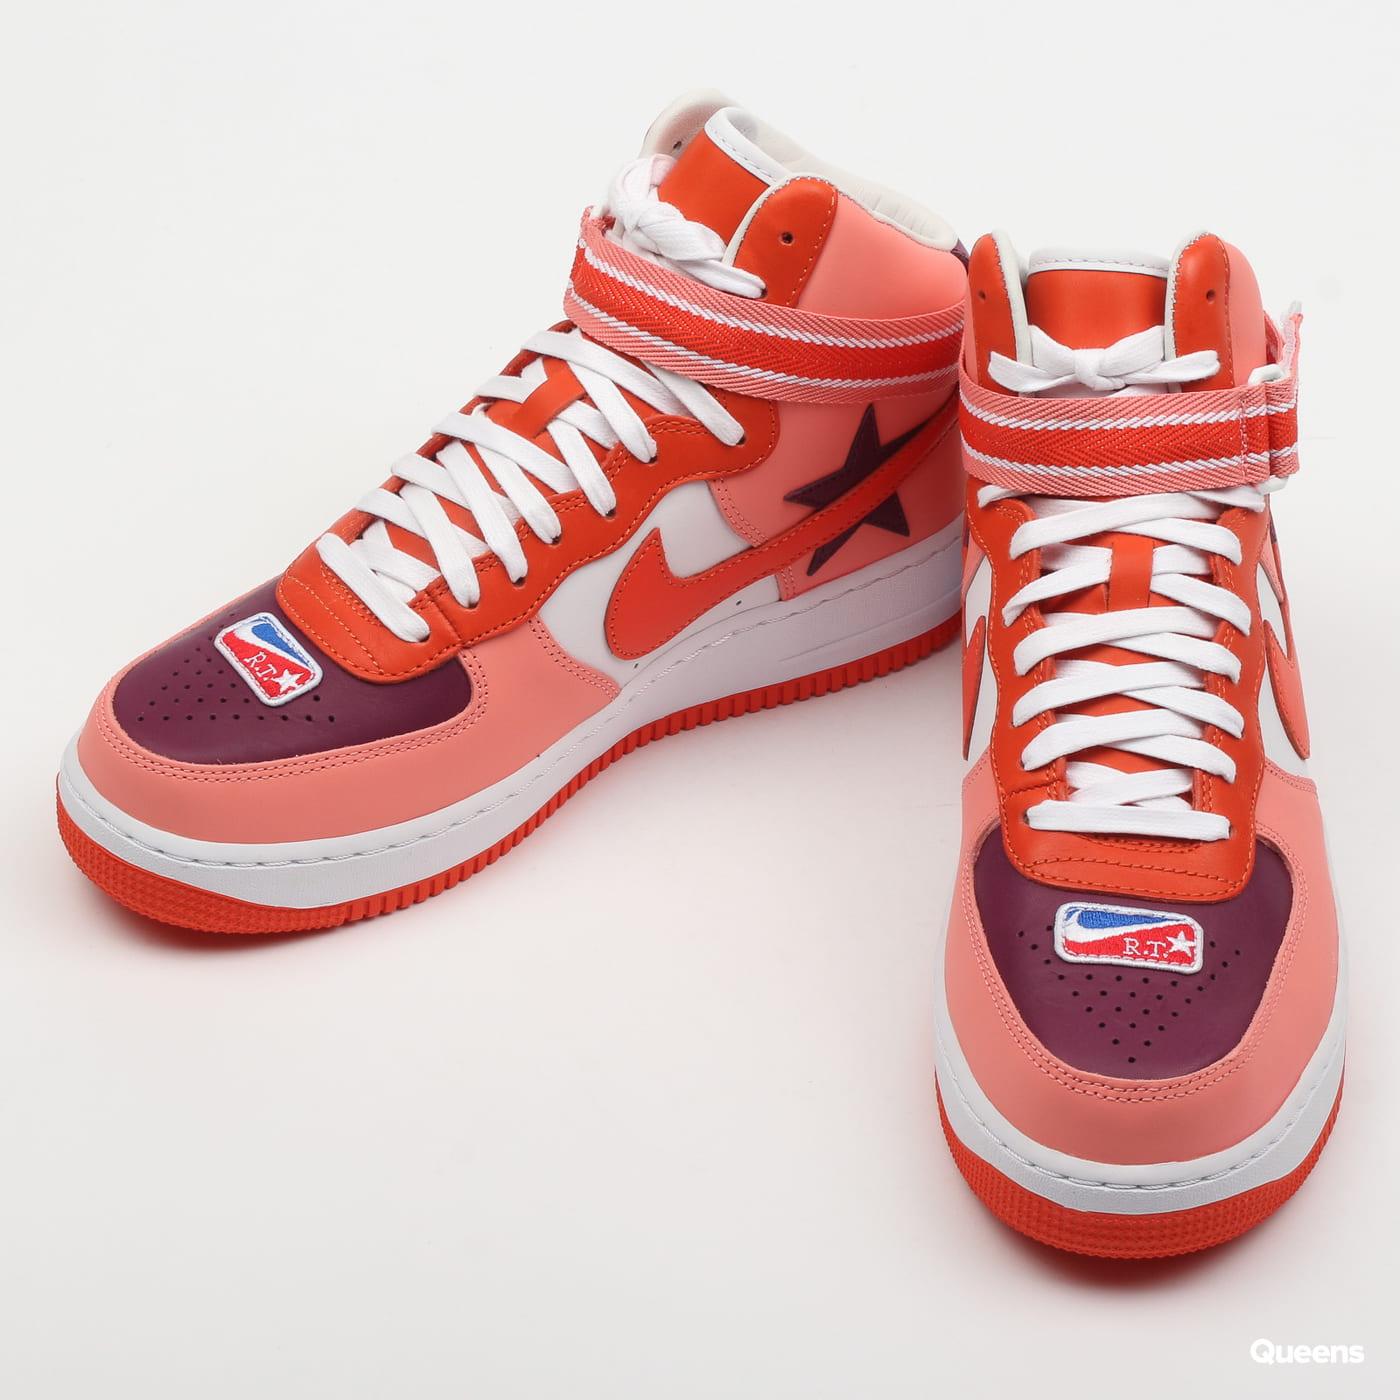 100% Guaranteed Nike Air Force 1 x Riccardo Tisci high shoes